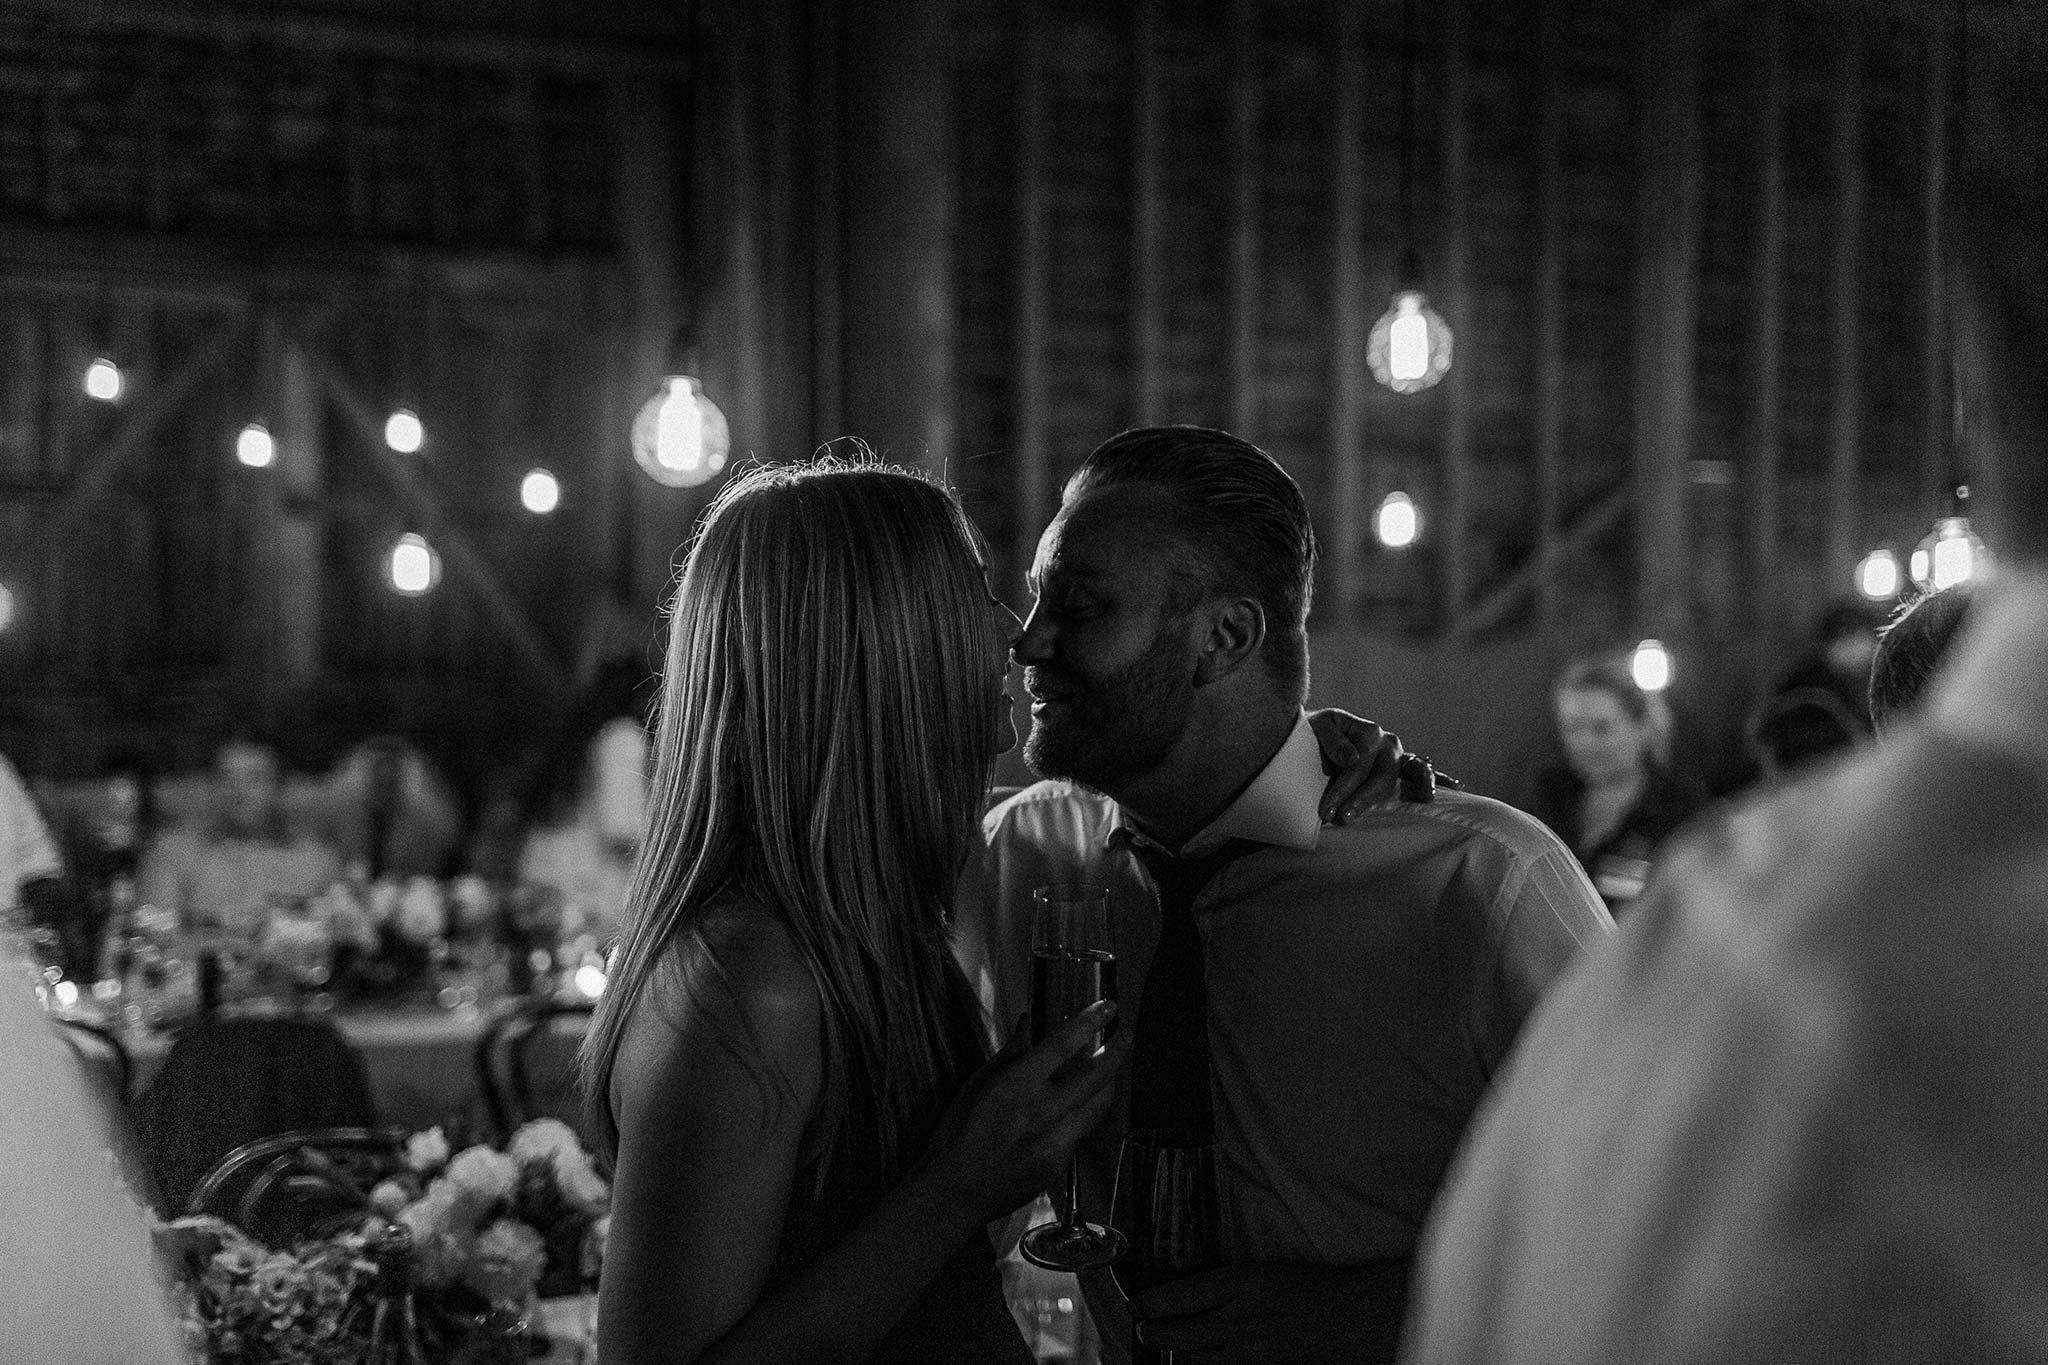 Launceston-Brickendon-barn-Wedding-Photographer-reception-guest-kiss